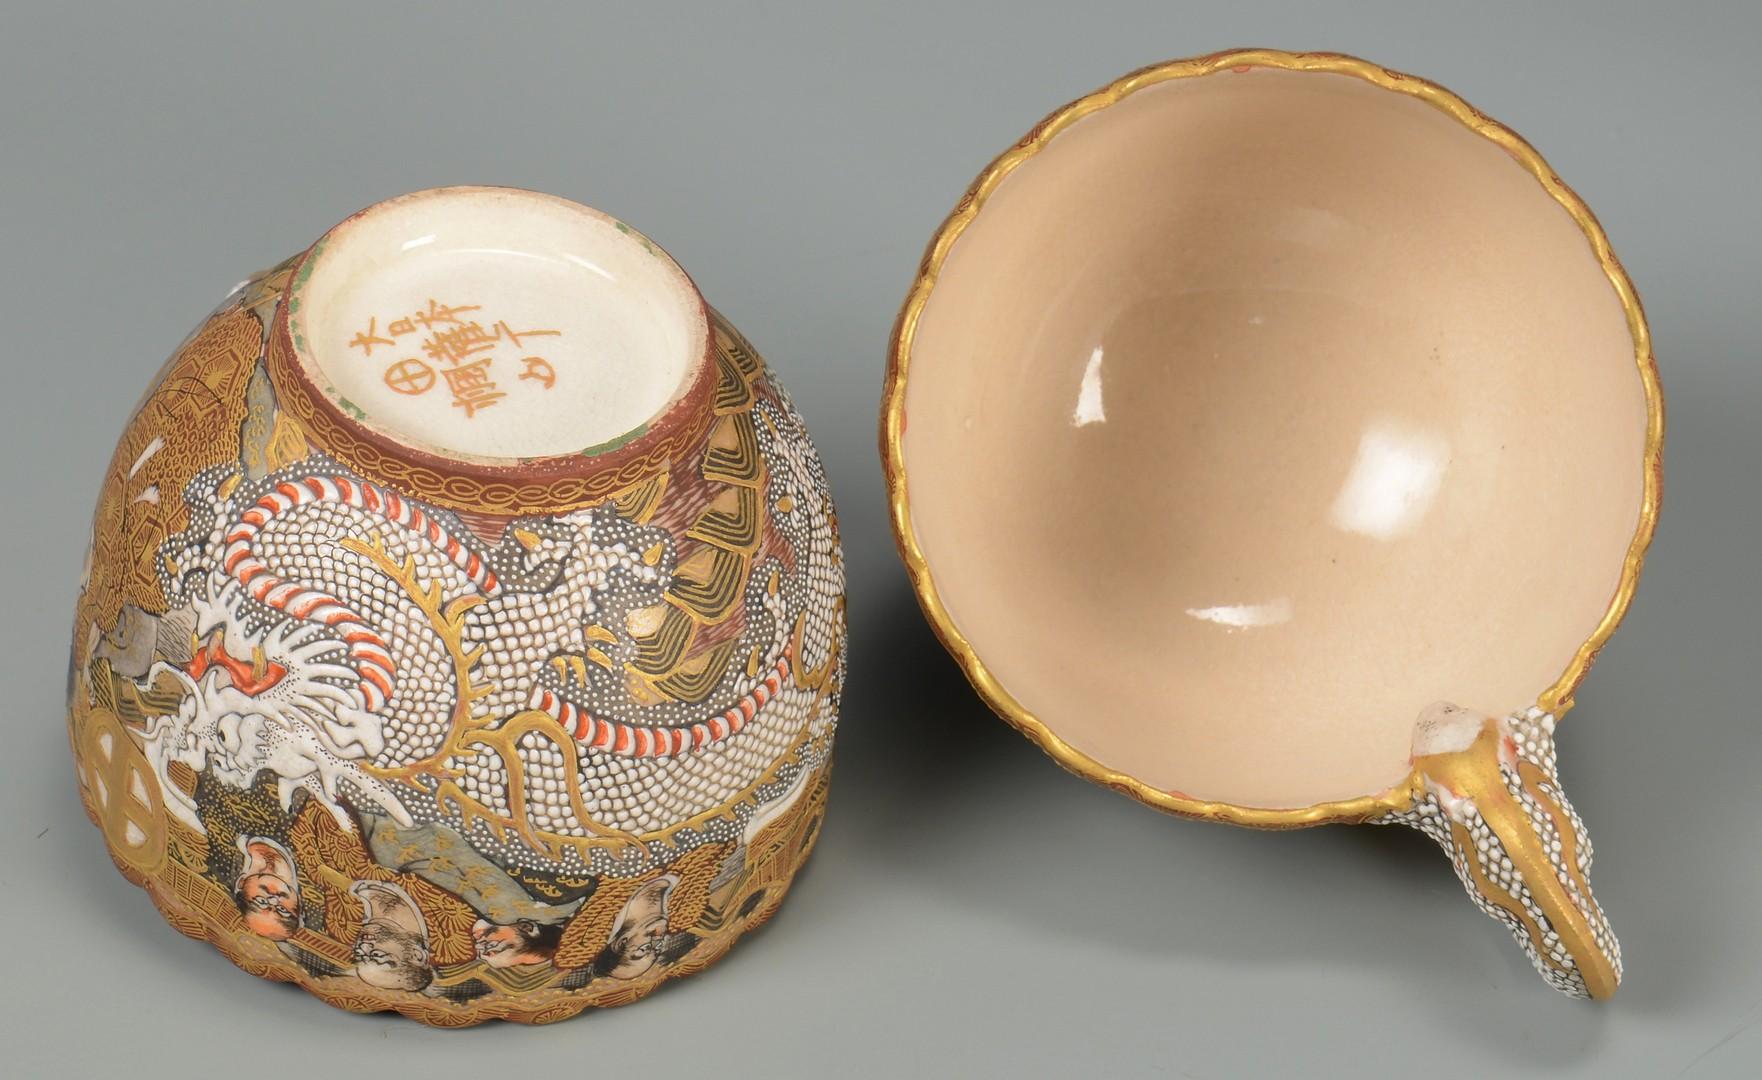 Lot 3594218: 2 Japanese Satsuma Tea Services, 23 pcs.